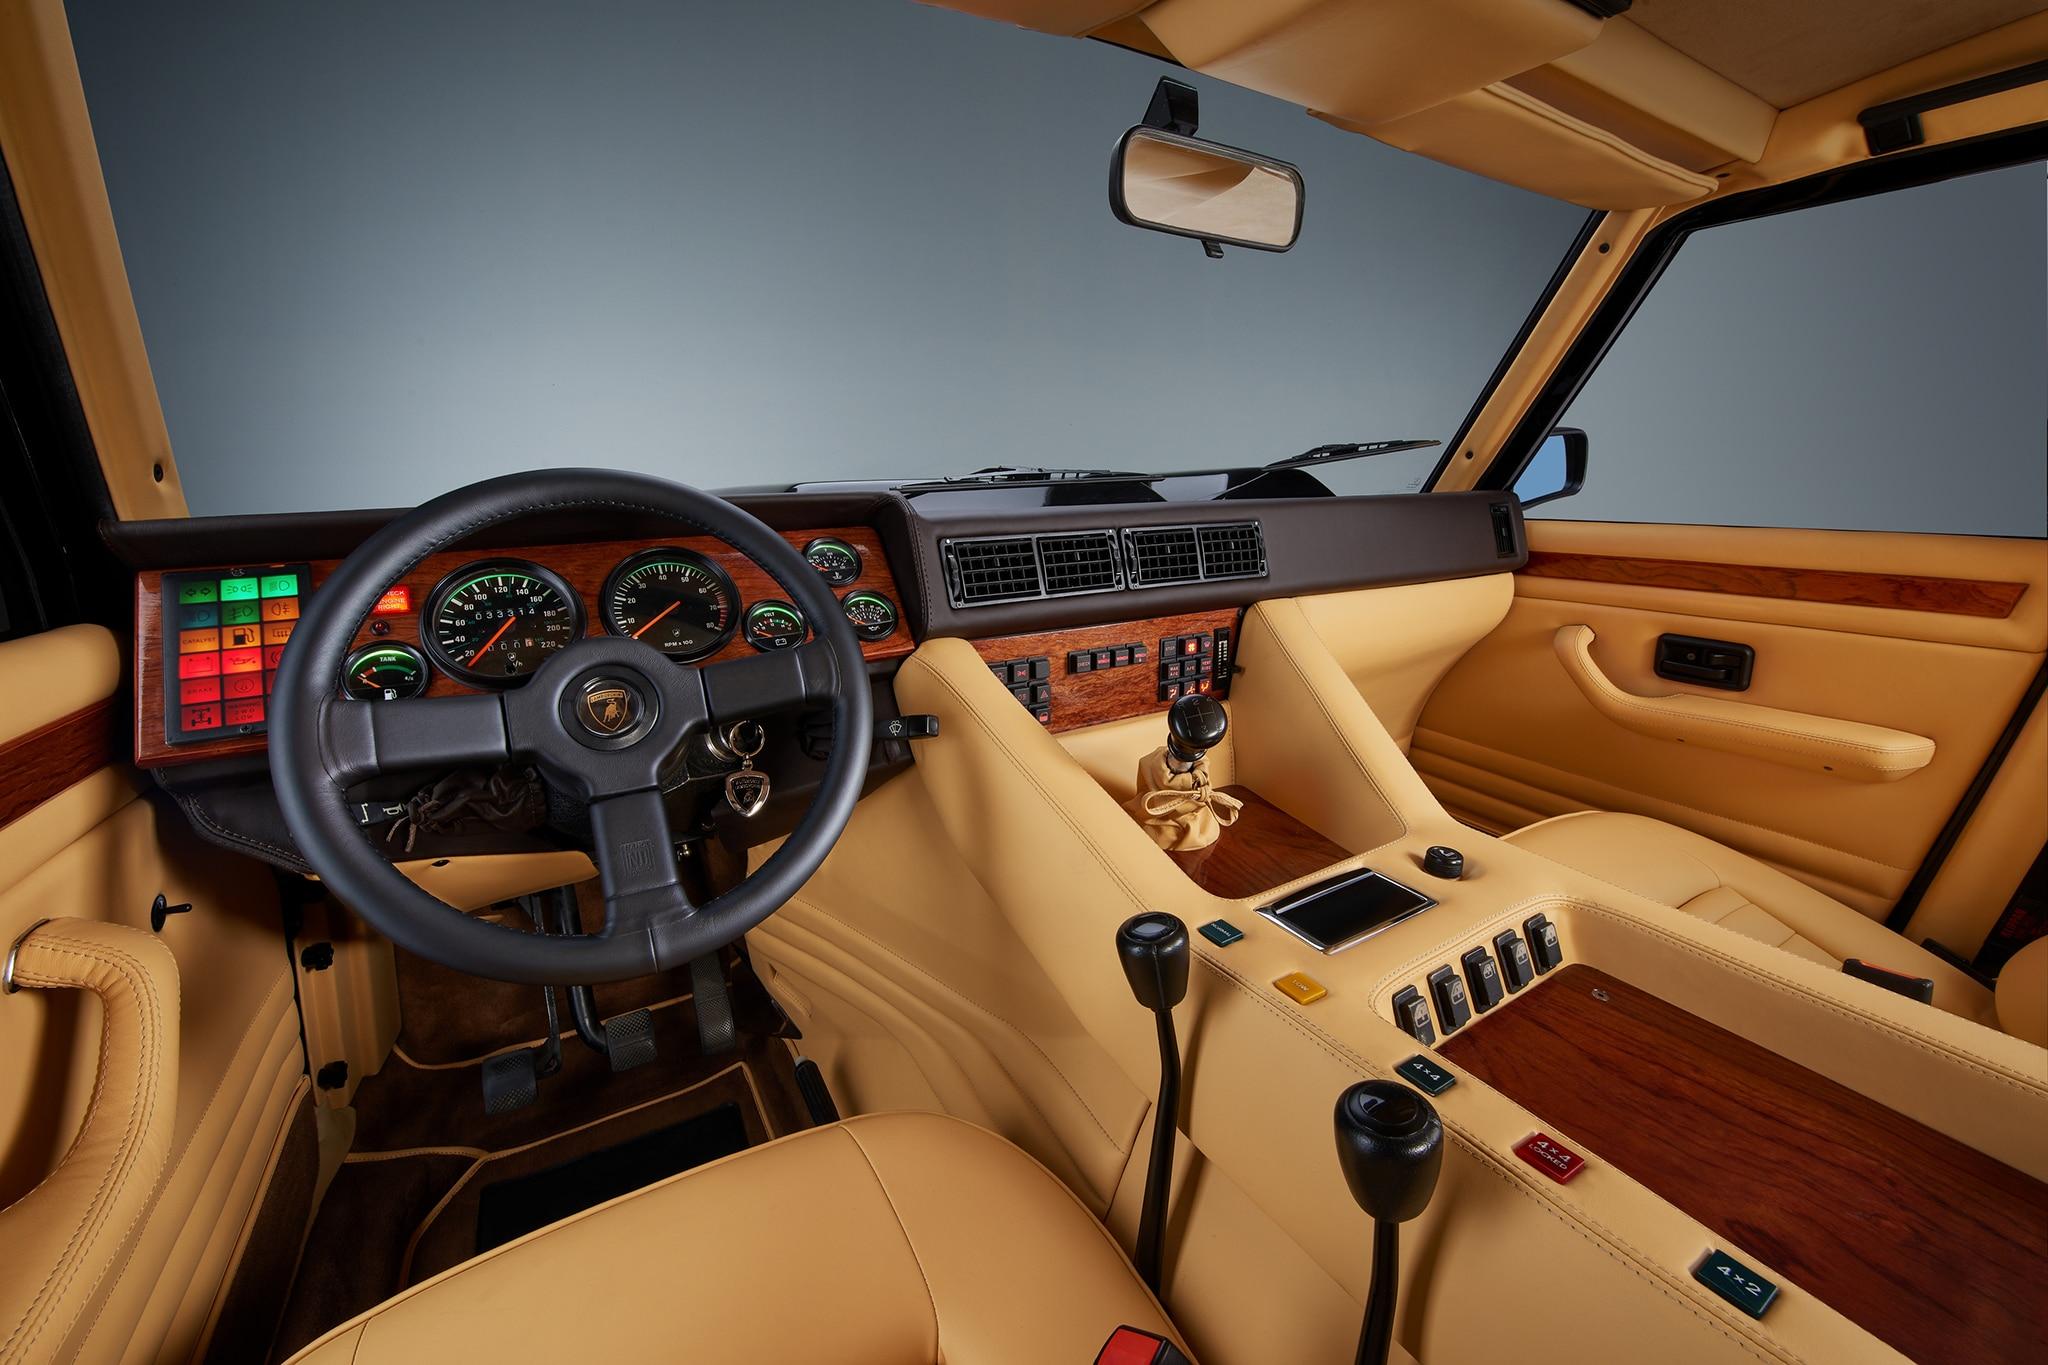 1986 1993 Lamborghini Lm002 Luxury Suv Review